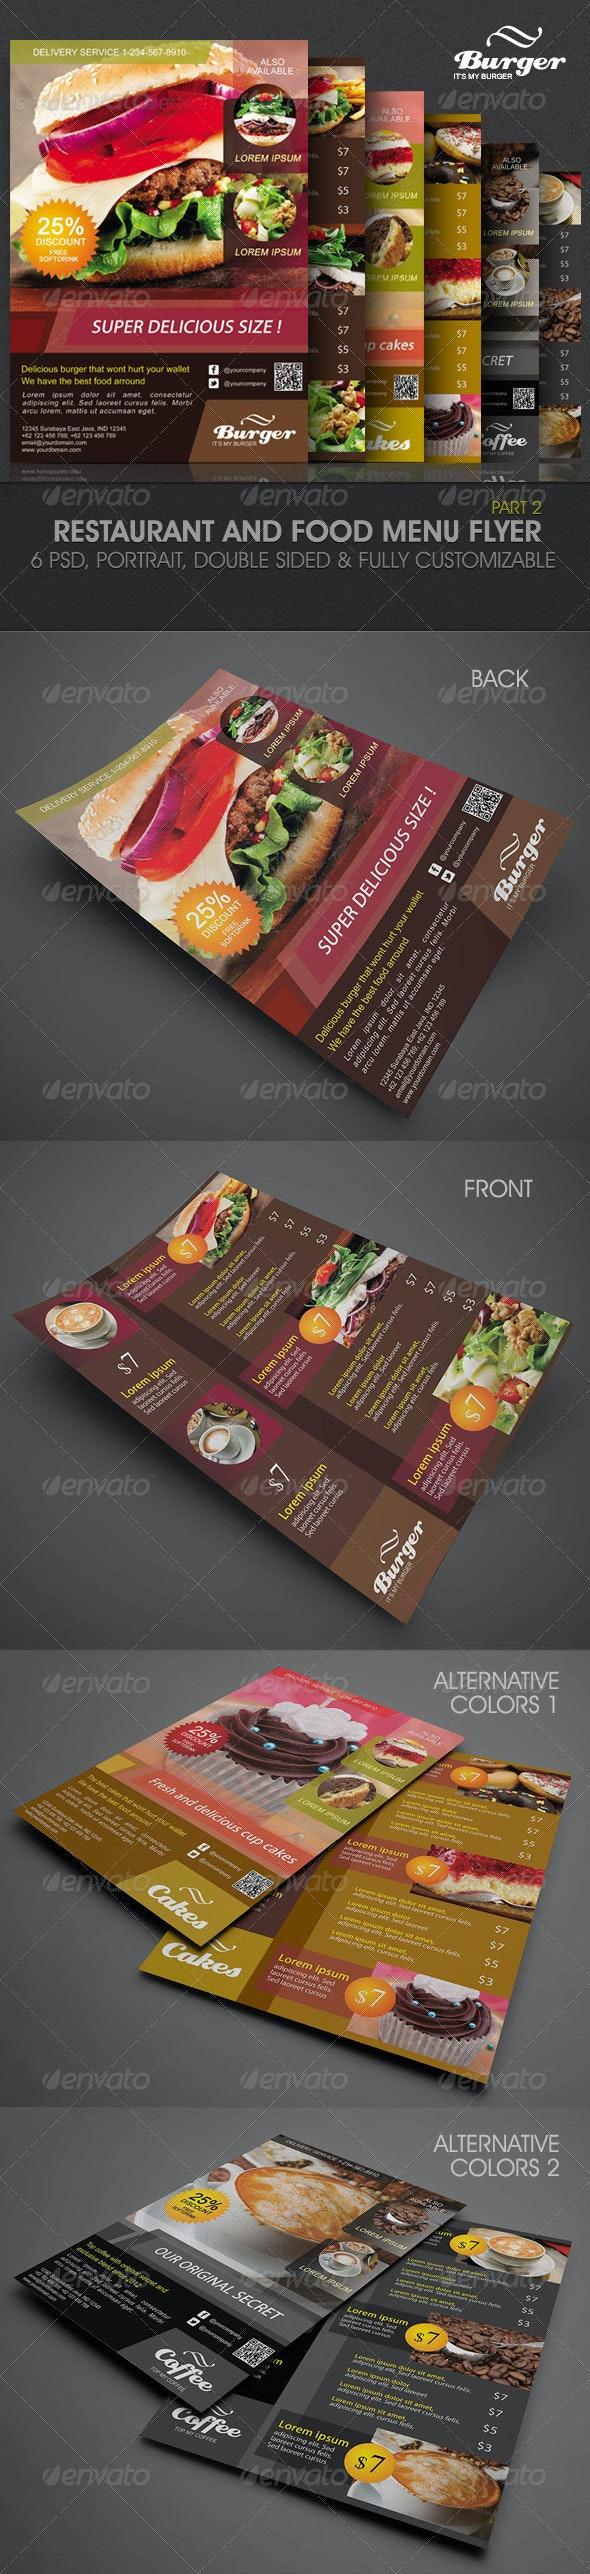 Restaurant and Food Menu Flyer - Food Menus Print Templates